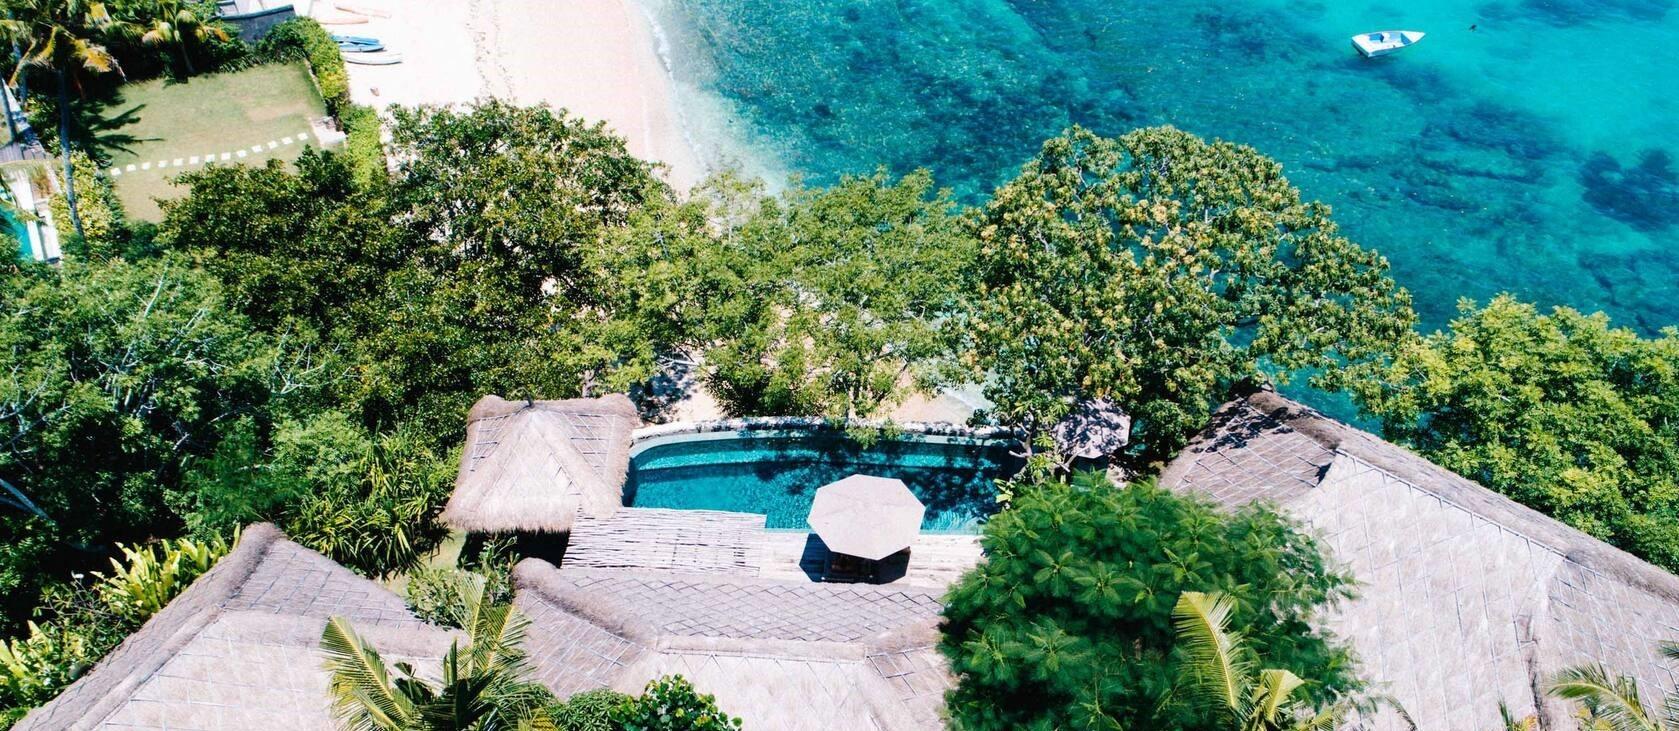 Bali Yoga Retreat Villa Nusa Lembongan